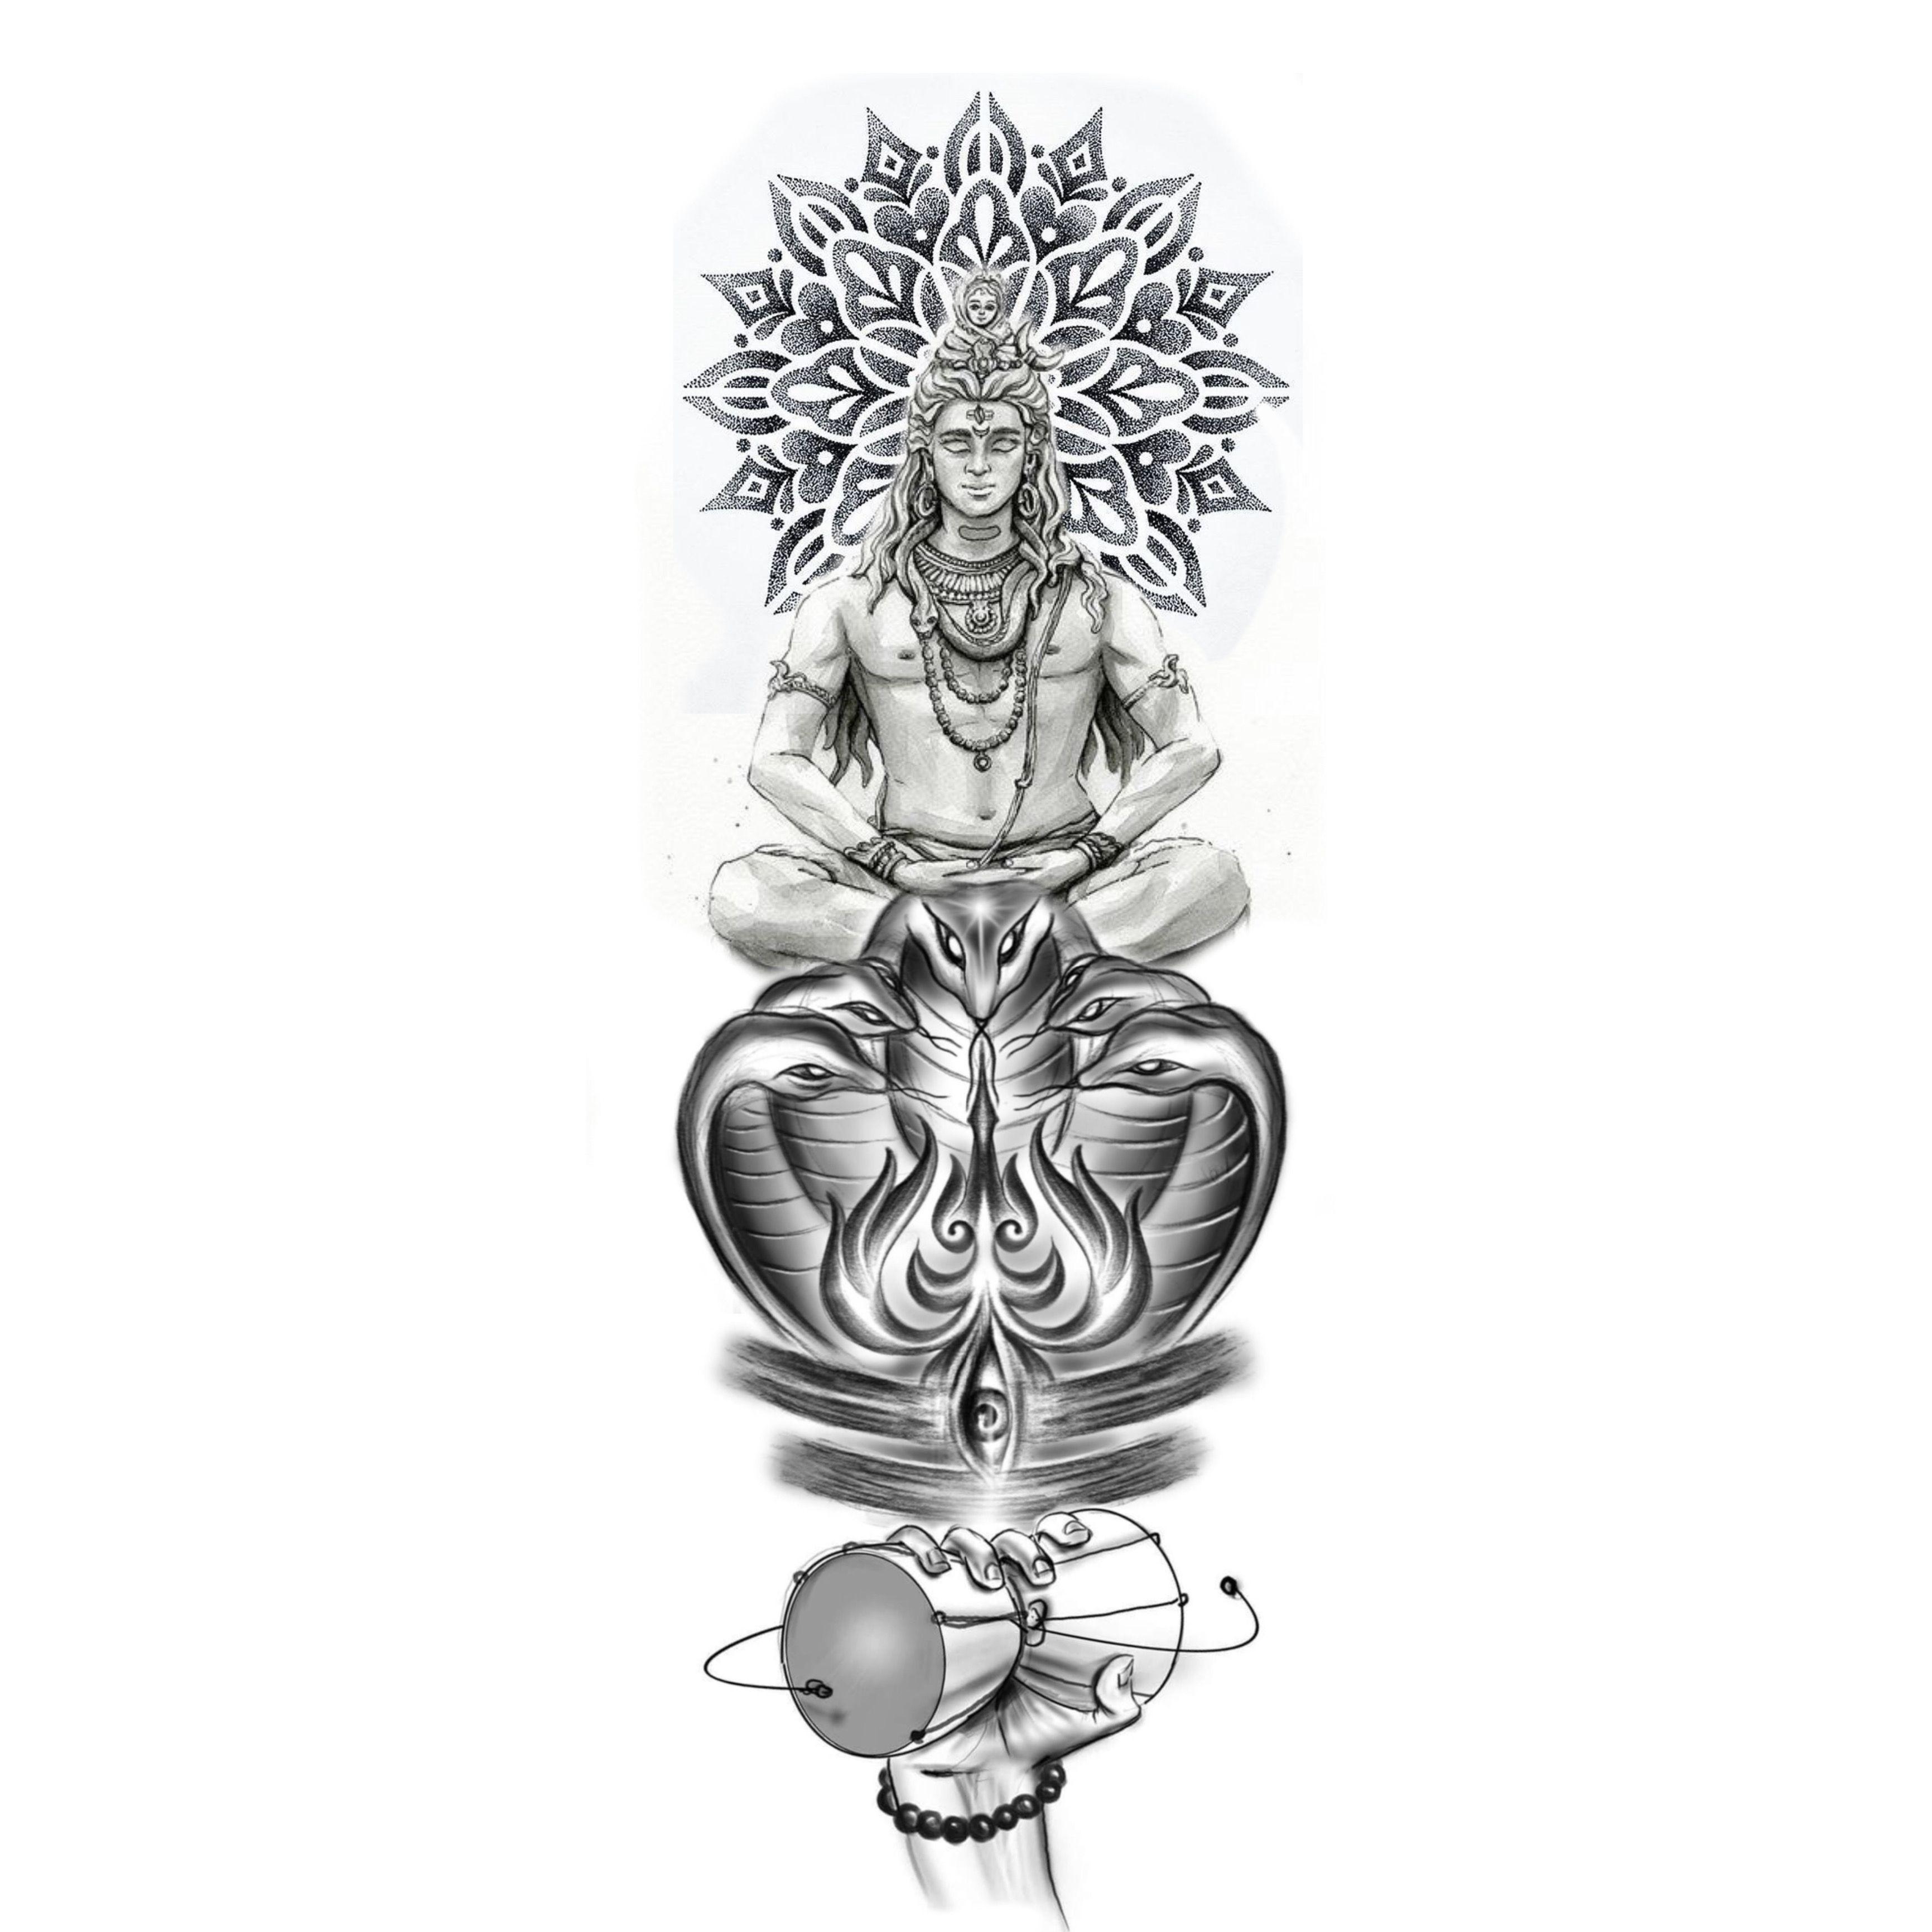 Shiva Tattoo Designs Shiva Tattoo Design Shiva Tattoo Om Tattoo Design Shiva tattoo wallpaper download